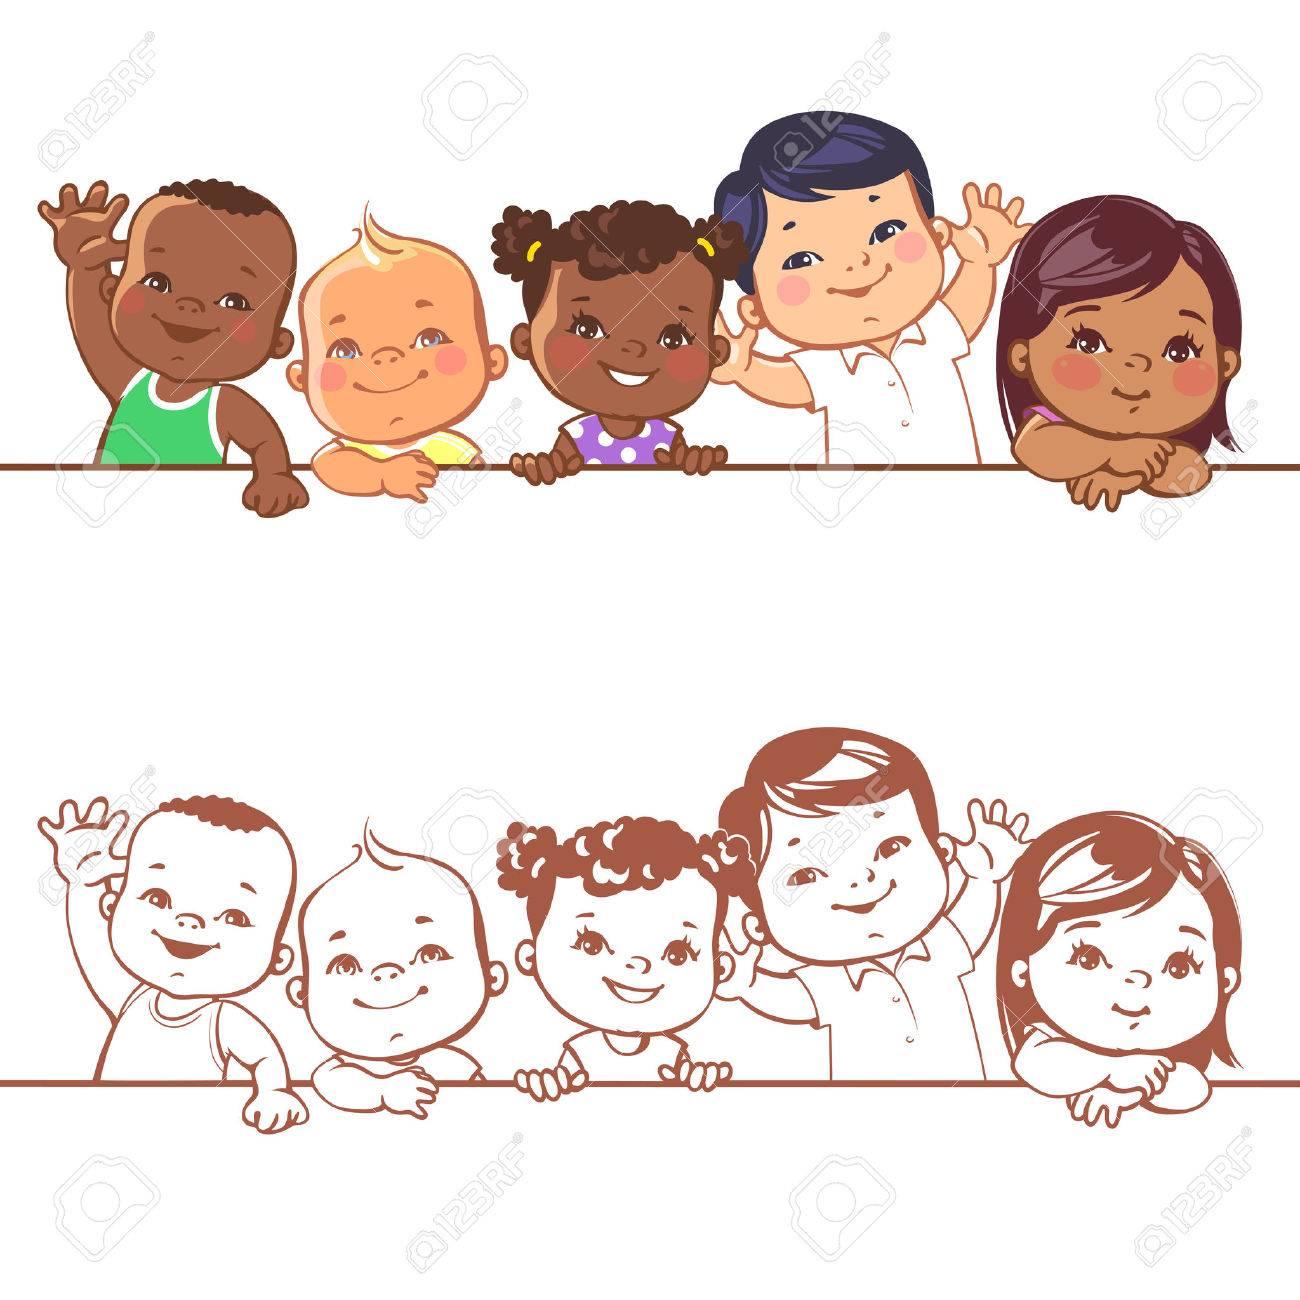 Multinational baby portrait. Multi-ethnic set of babies. Diverse nationalities. Toddlers holding blank banner. Vector illustration for school or kindergar en - 66881623